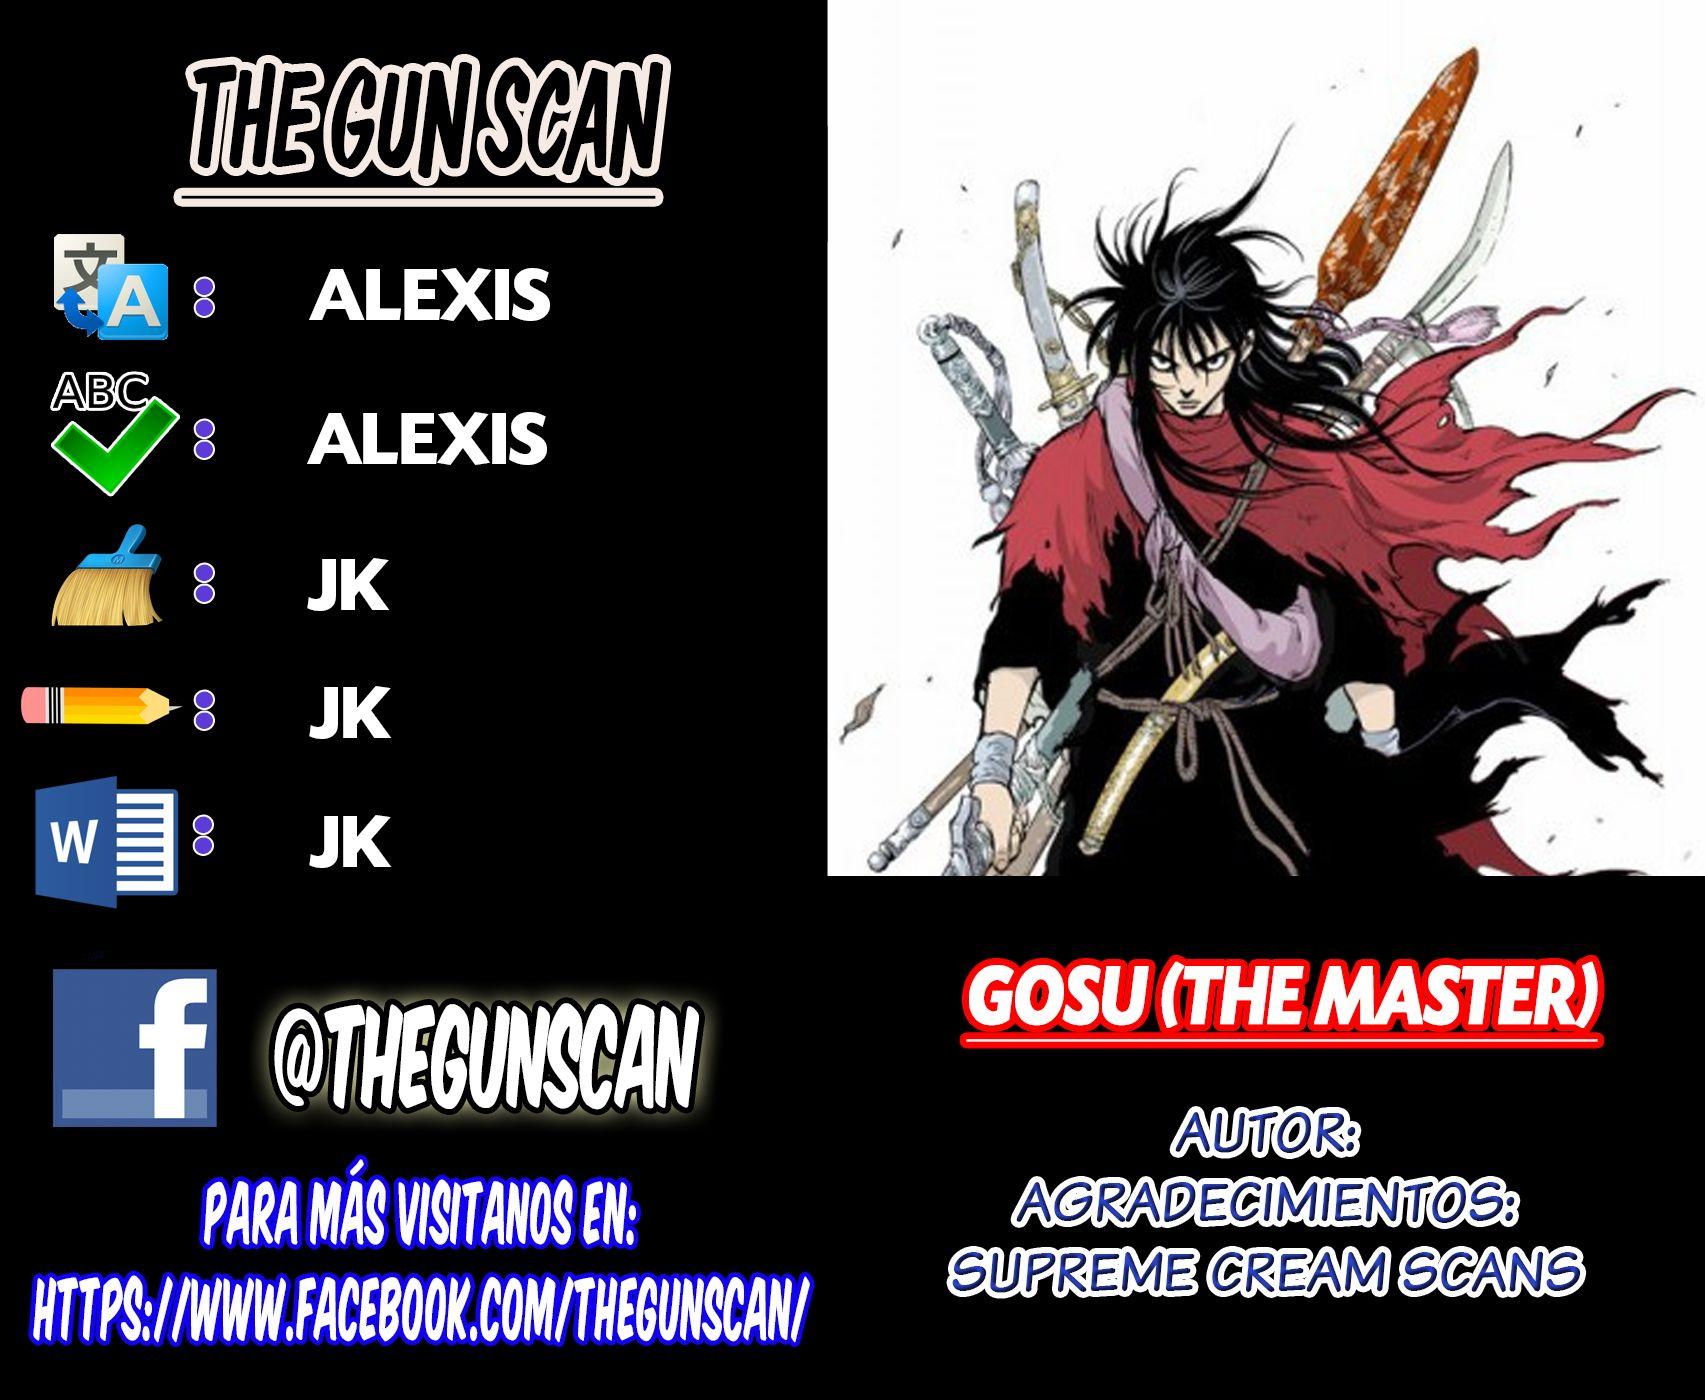 https://c5.ninemanga.com/es_manga/pic2/9/18249/512506/f42b6fceaaa66d575f804f7053fa5cc9.jpg Page 1